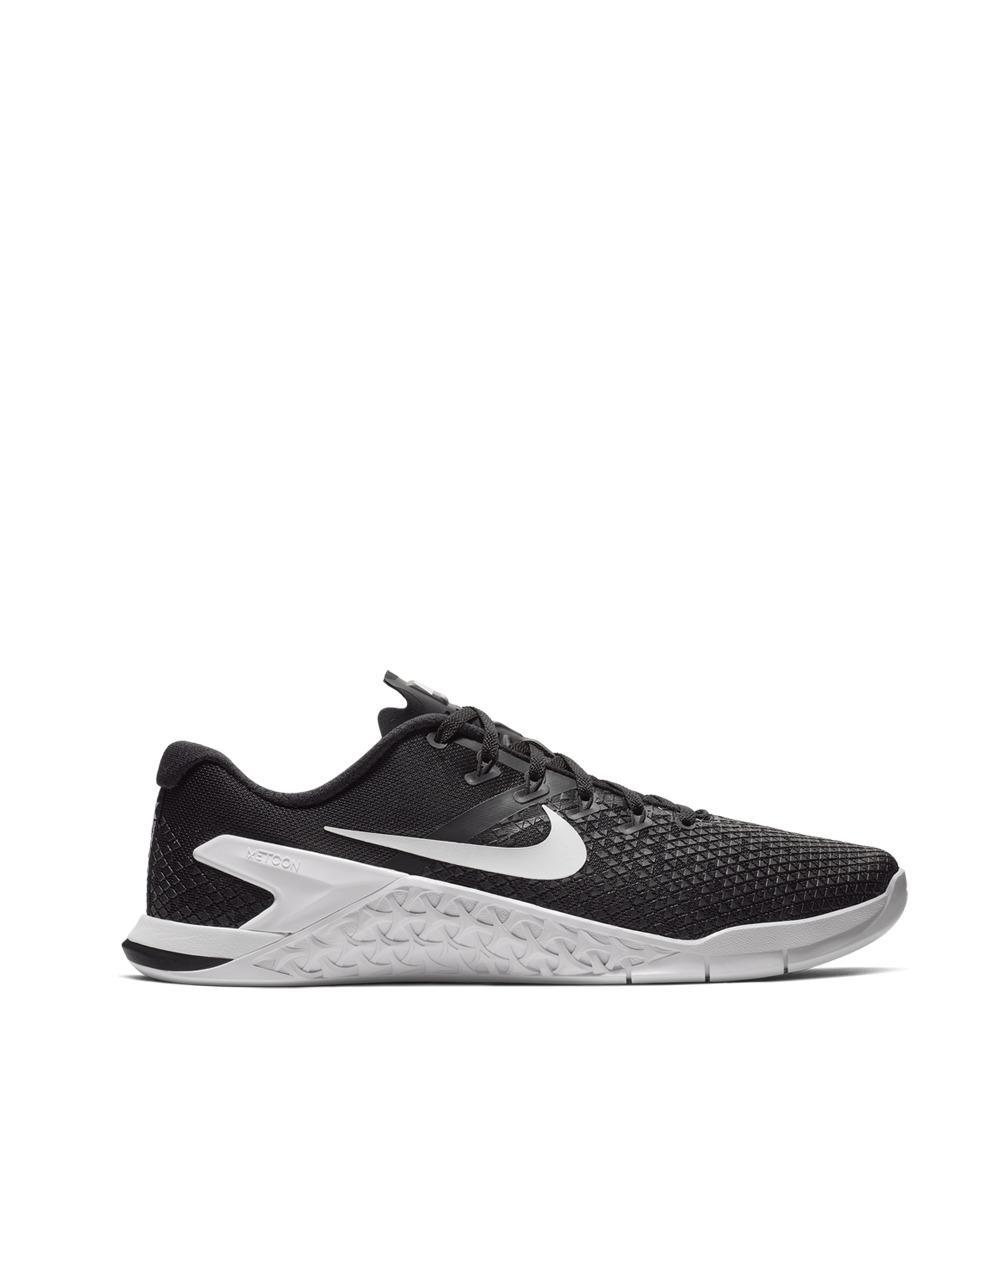 1883cc90083b6 Nike. Men's Black Metcon 4 Xd Fitness/cross Training Shoes. £111 From El  Corte Ingles